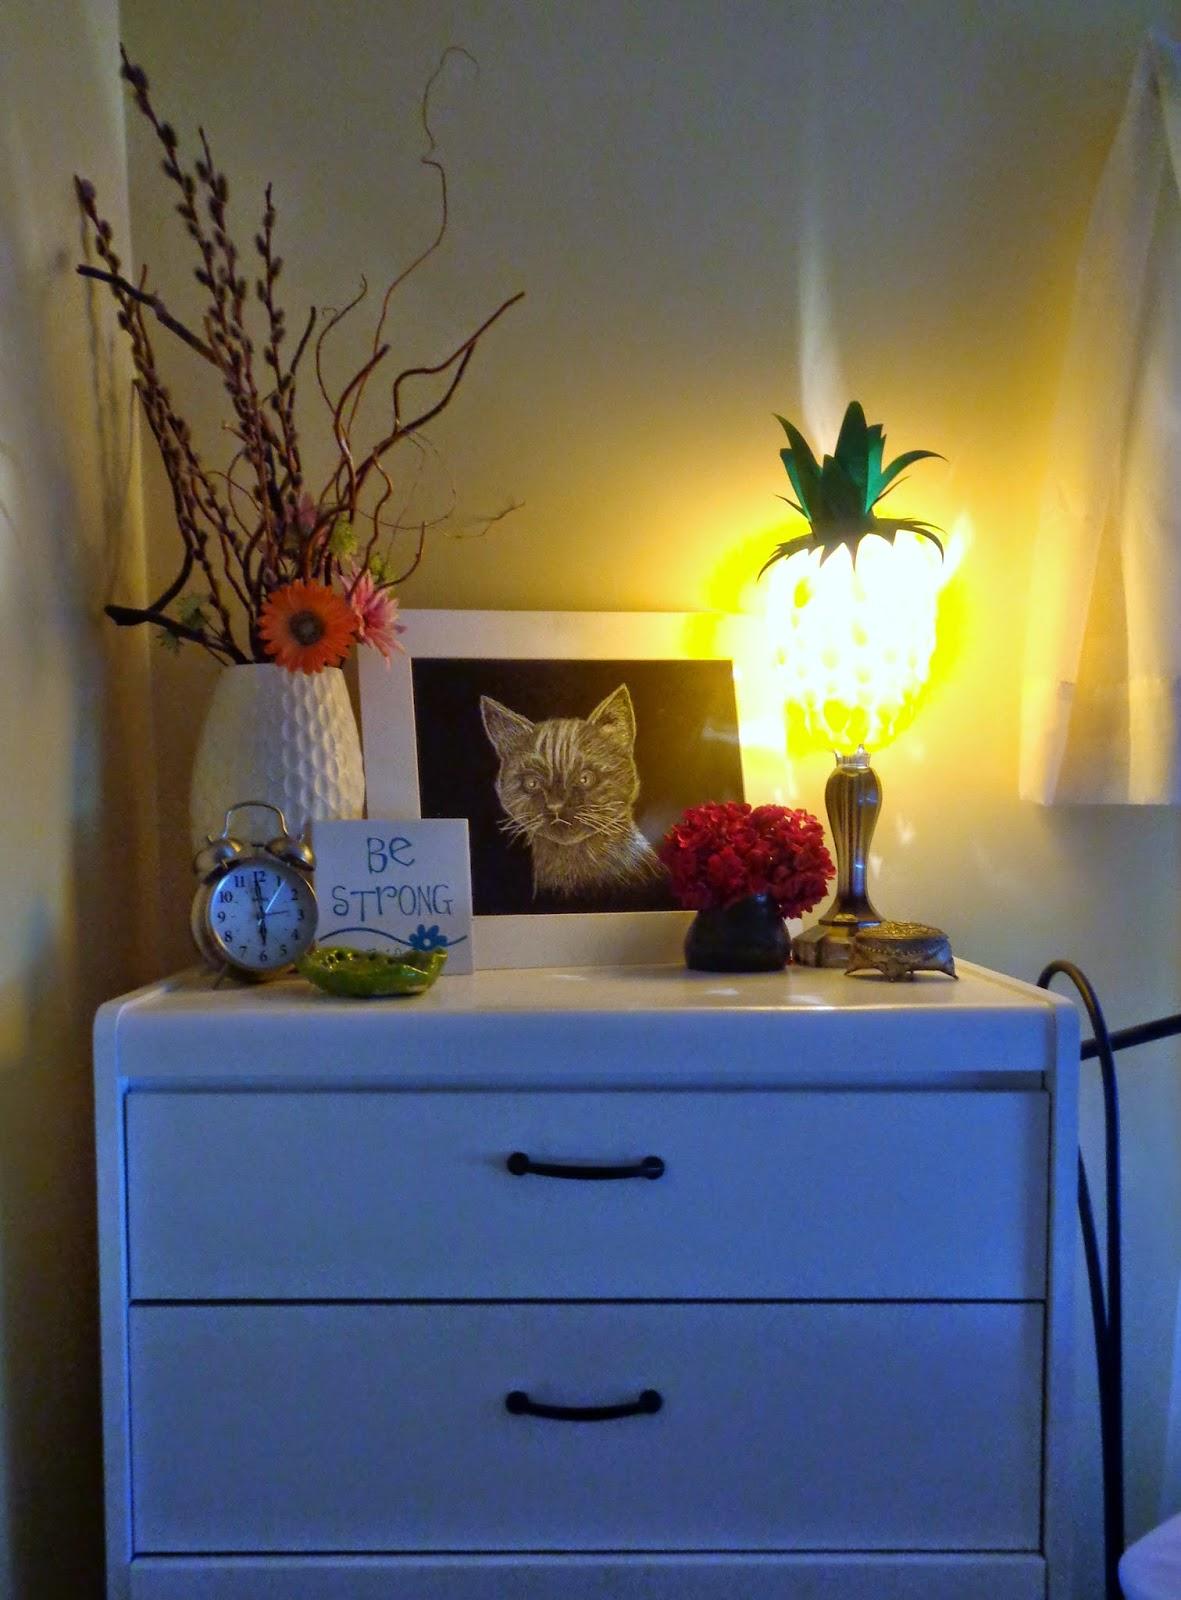 Room Decor: Harli G: DIY Pineapple Room Decor